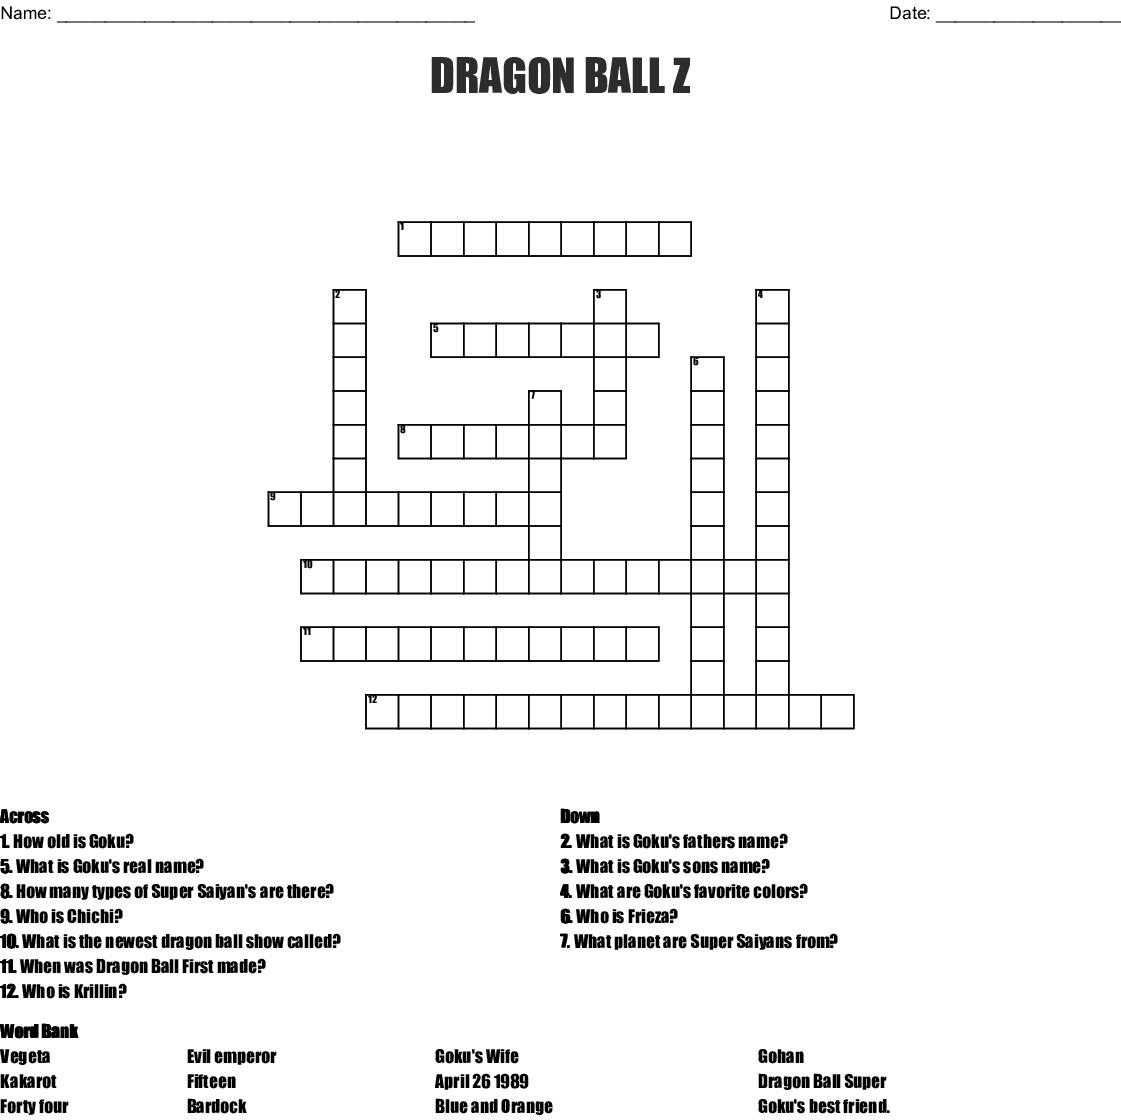 Dragon Ball Z Crossword